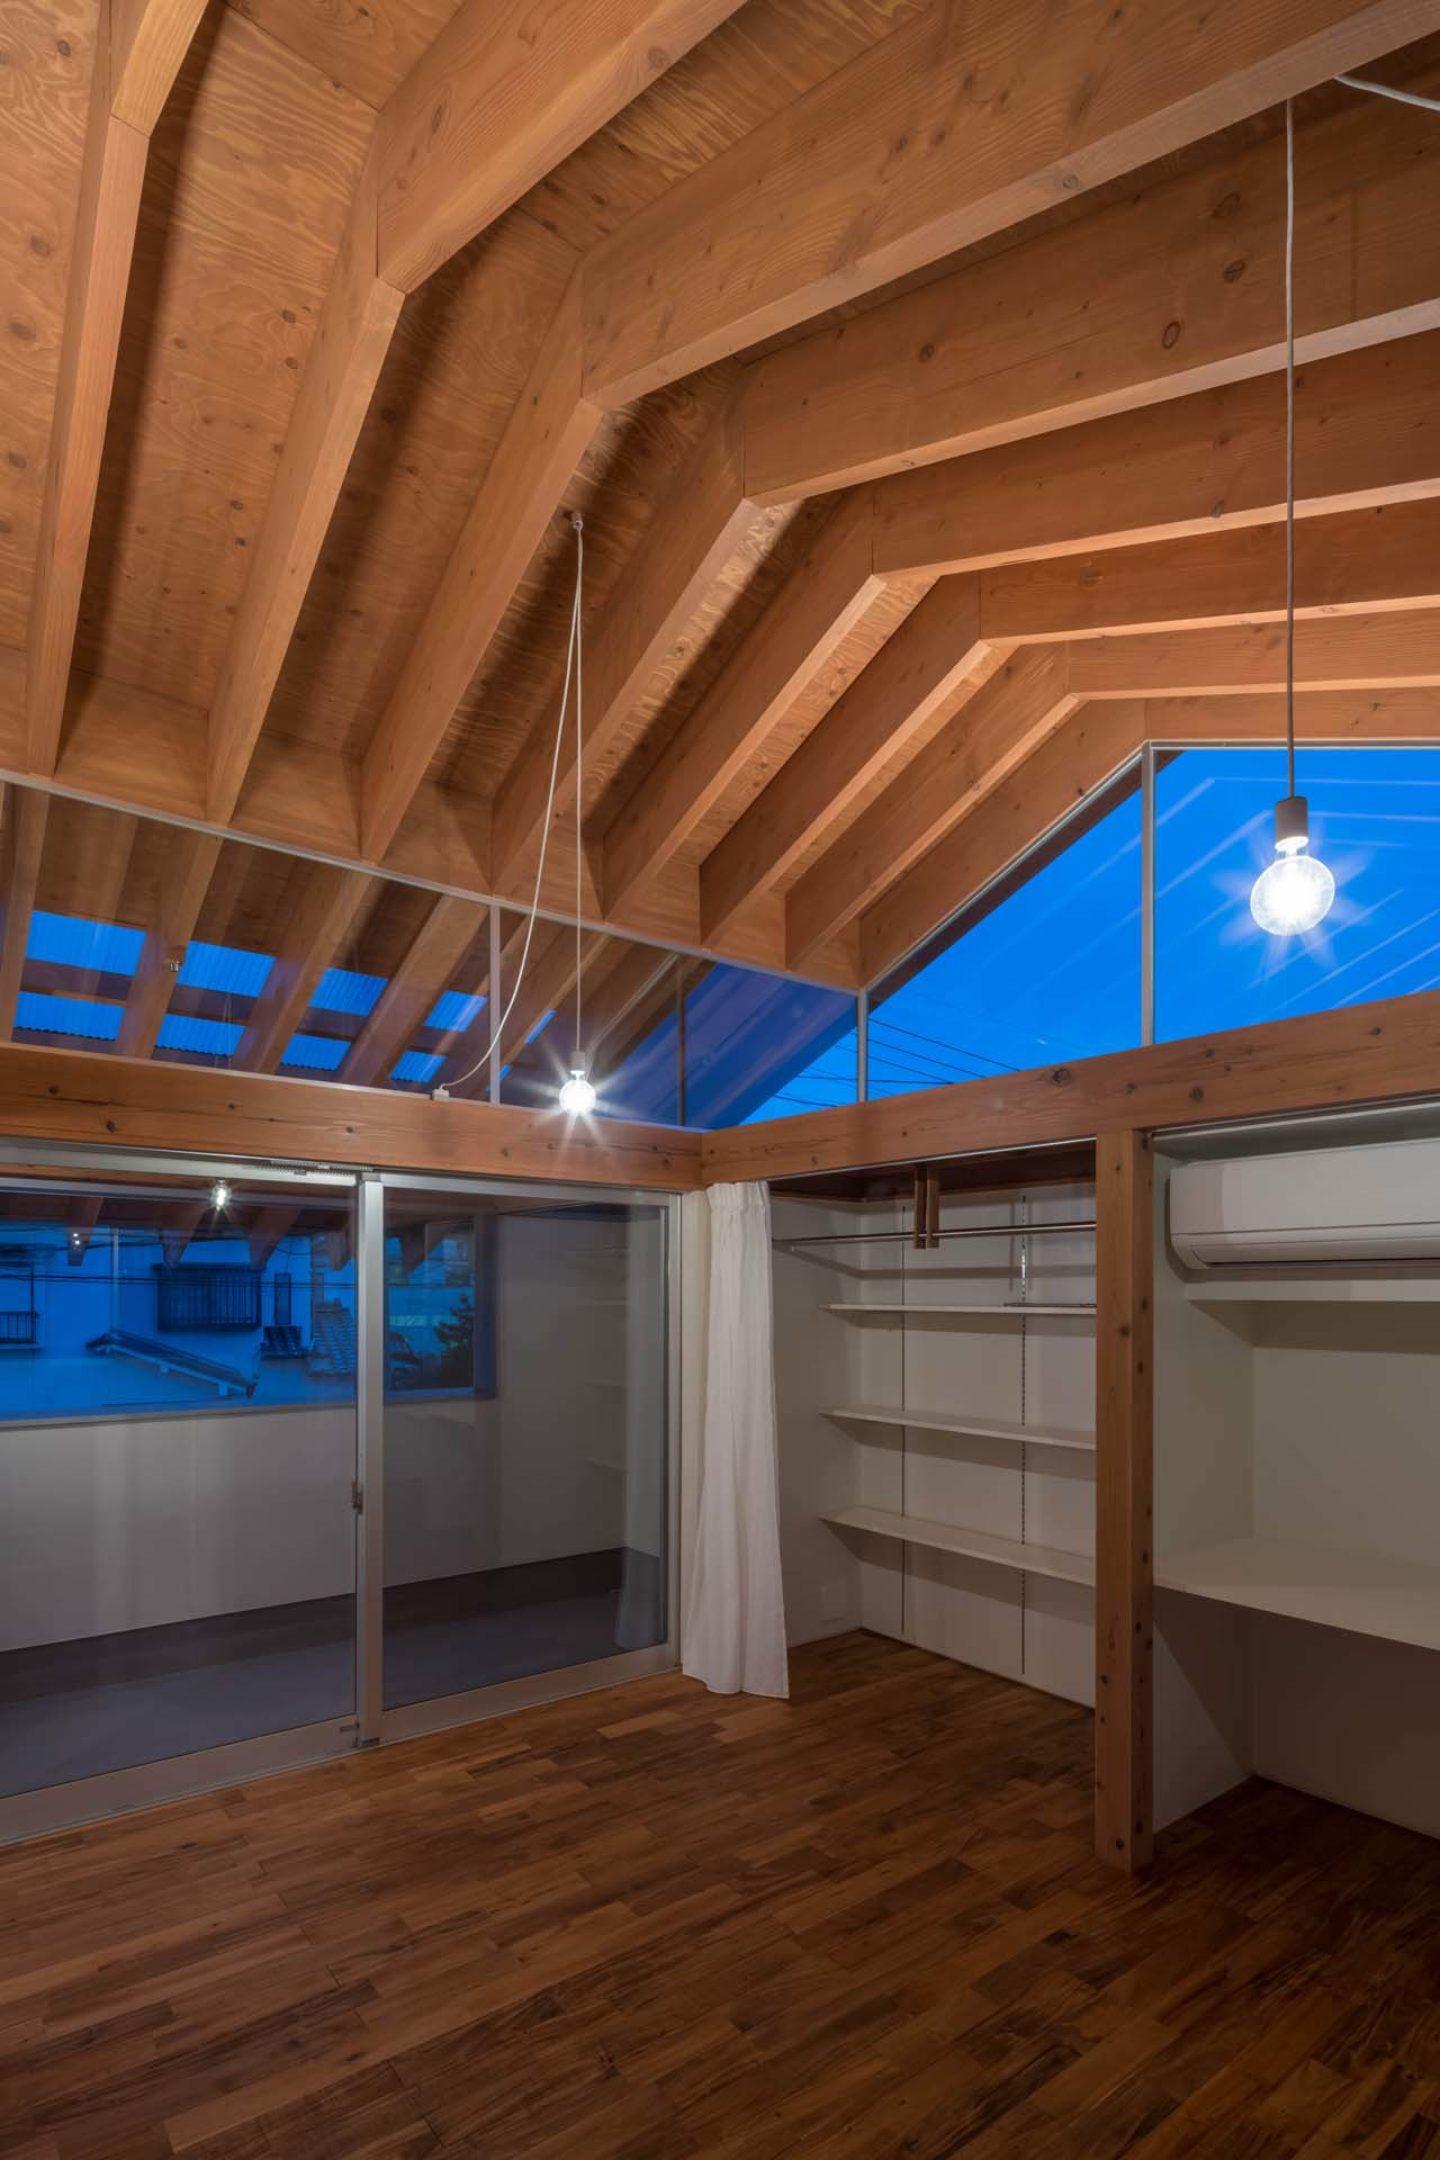 IGNANT-Architecture-Kota-Mizuishi-House-In-Otai-0013